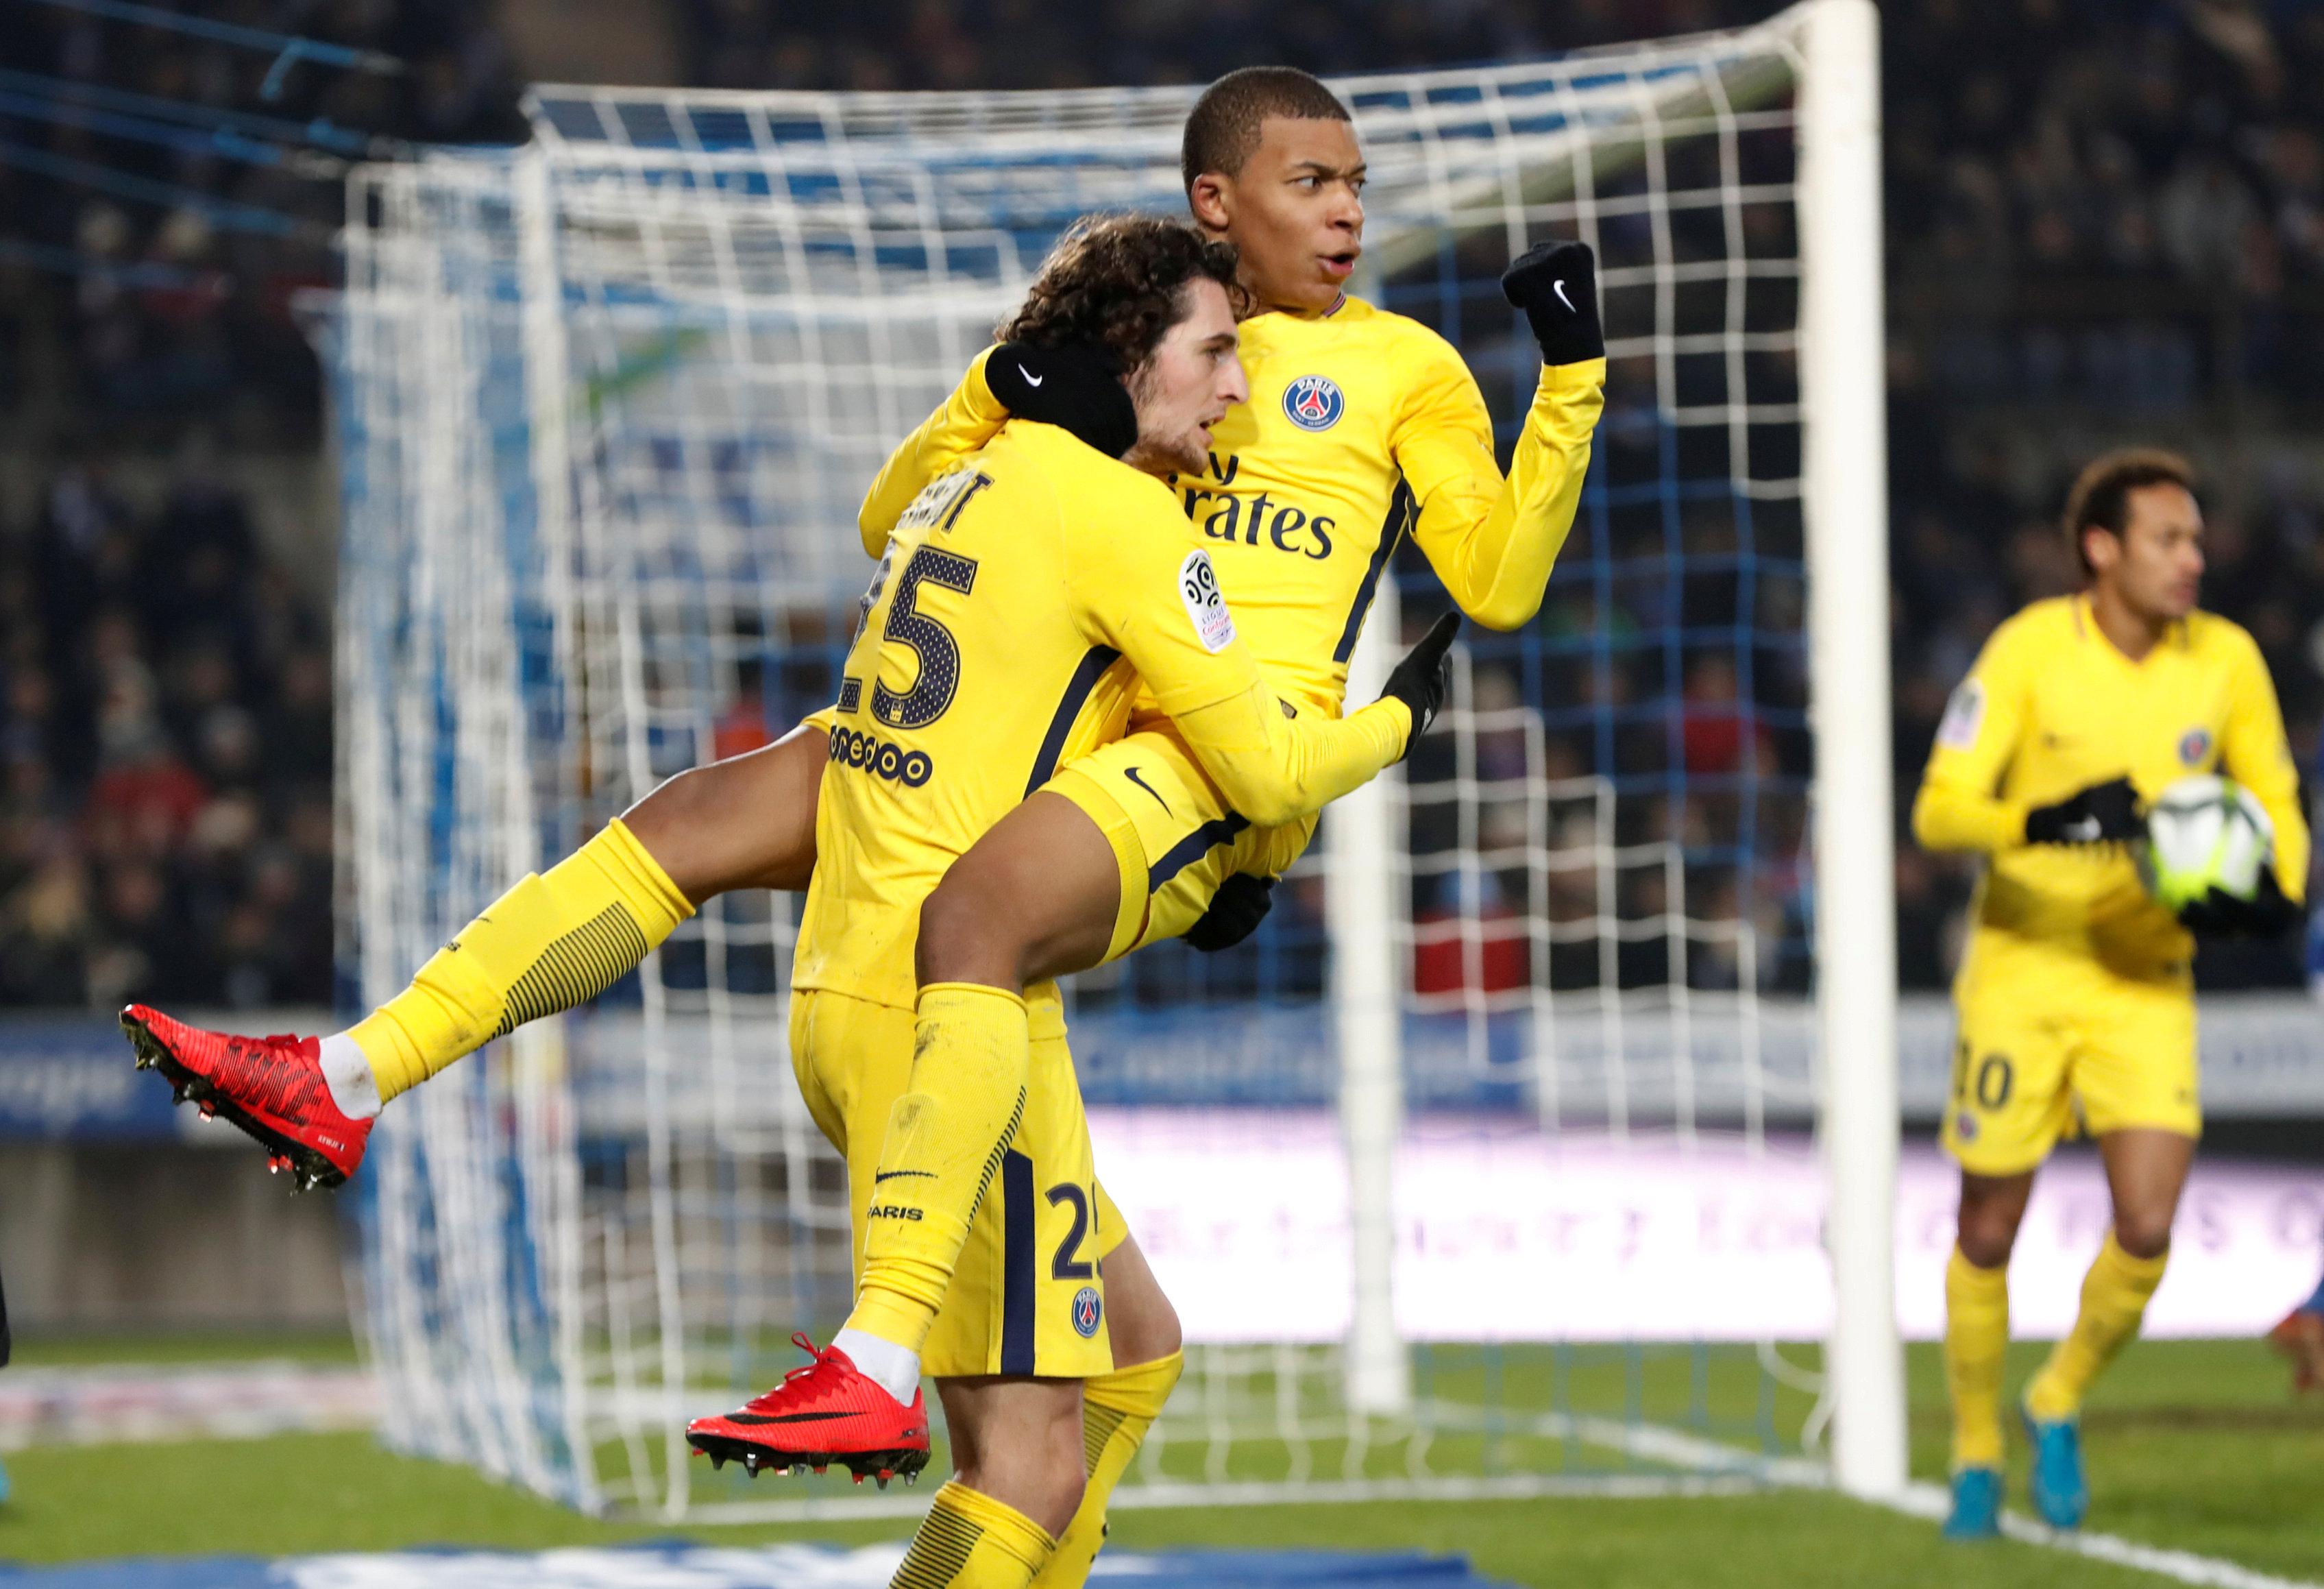 Niềm vui của Mbappe sau khi gỡ hòa 1-1 cho PSG. Ảnh: REUTERS